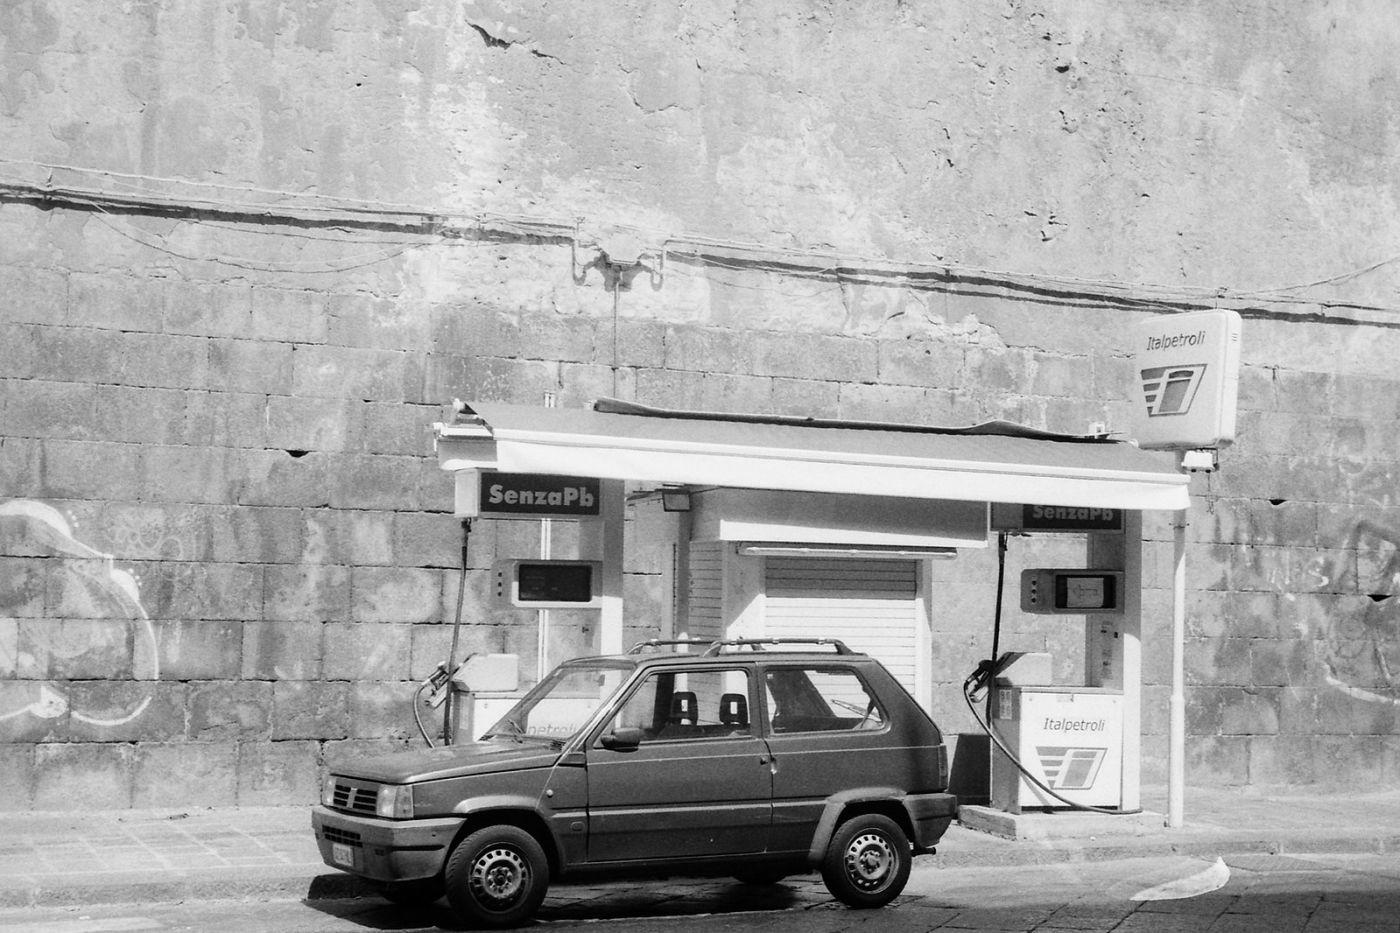 Catania Italpetroli via A di Sangiuliano (scan from negative, Ilford Delta 400, Leica IIIc, Summitar 5cm f2), foto di NAC, CC BY-SA 4.0, via Wikimedia Commons